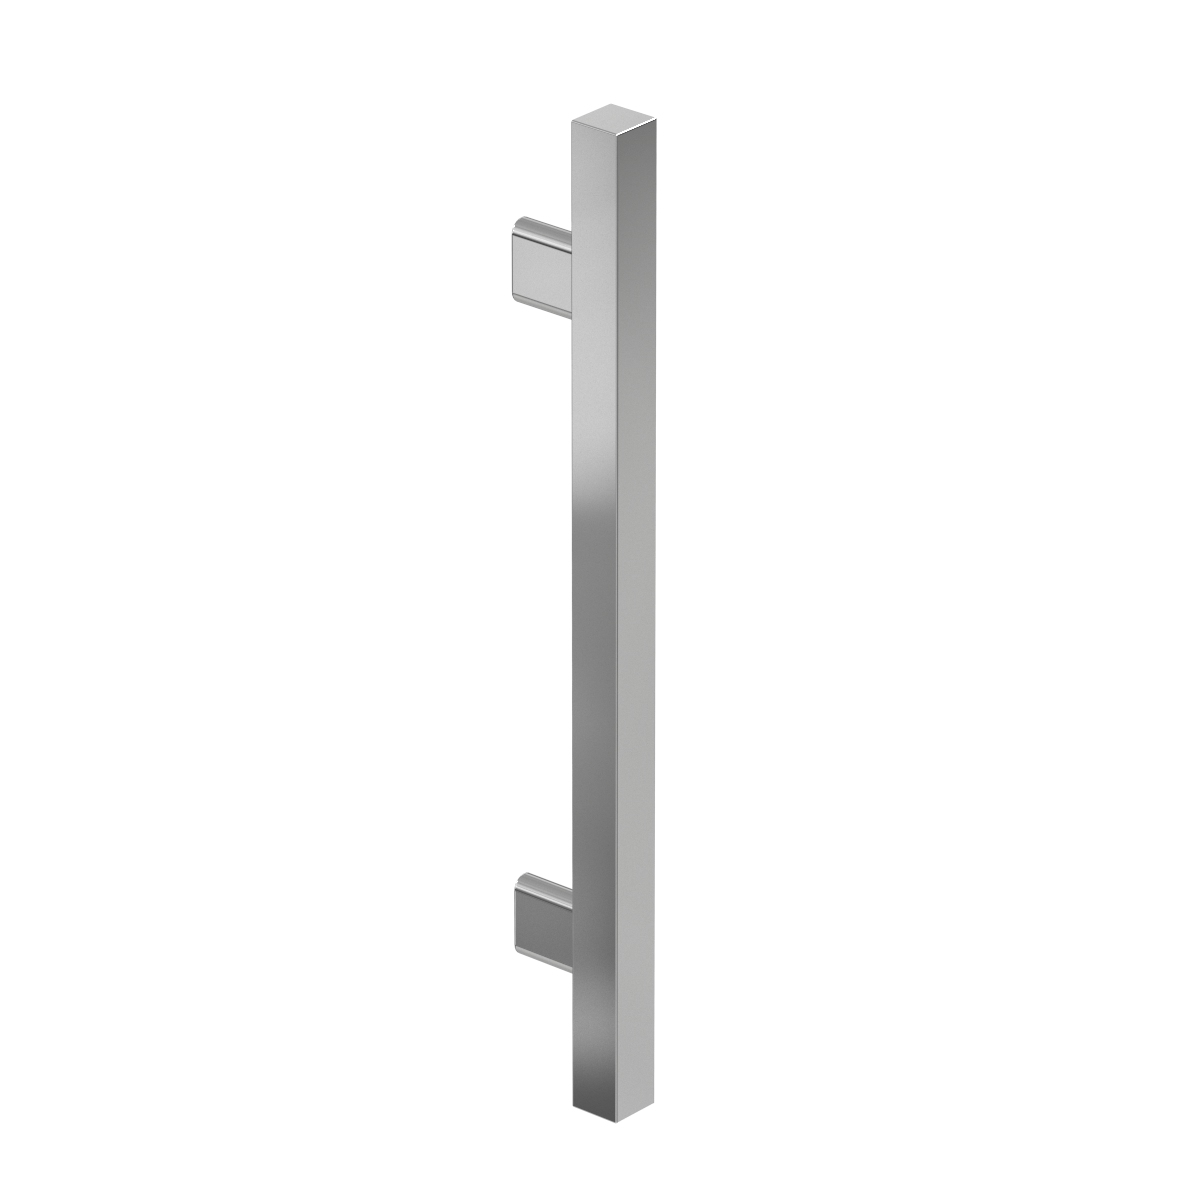 SMH_Architectural Pull_Modern_Rectangular_D432